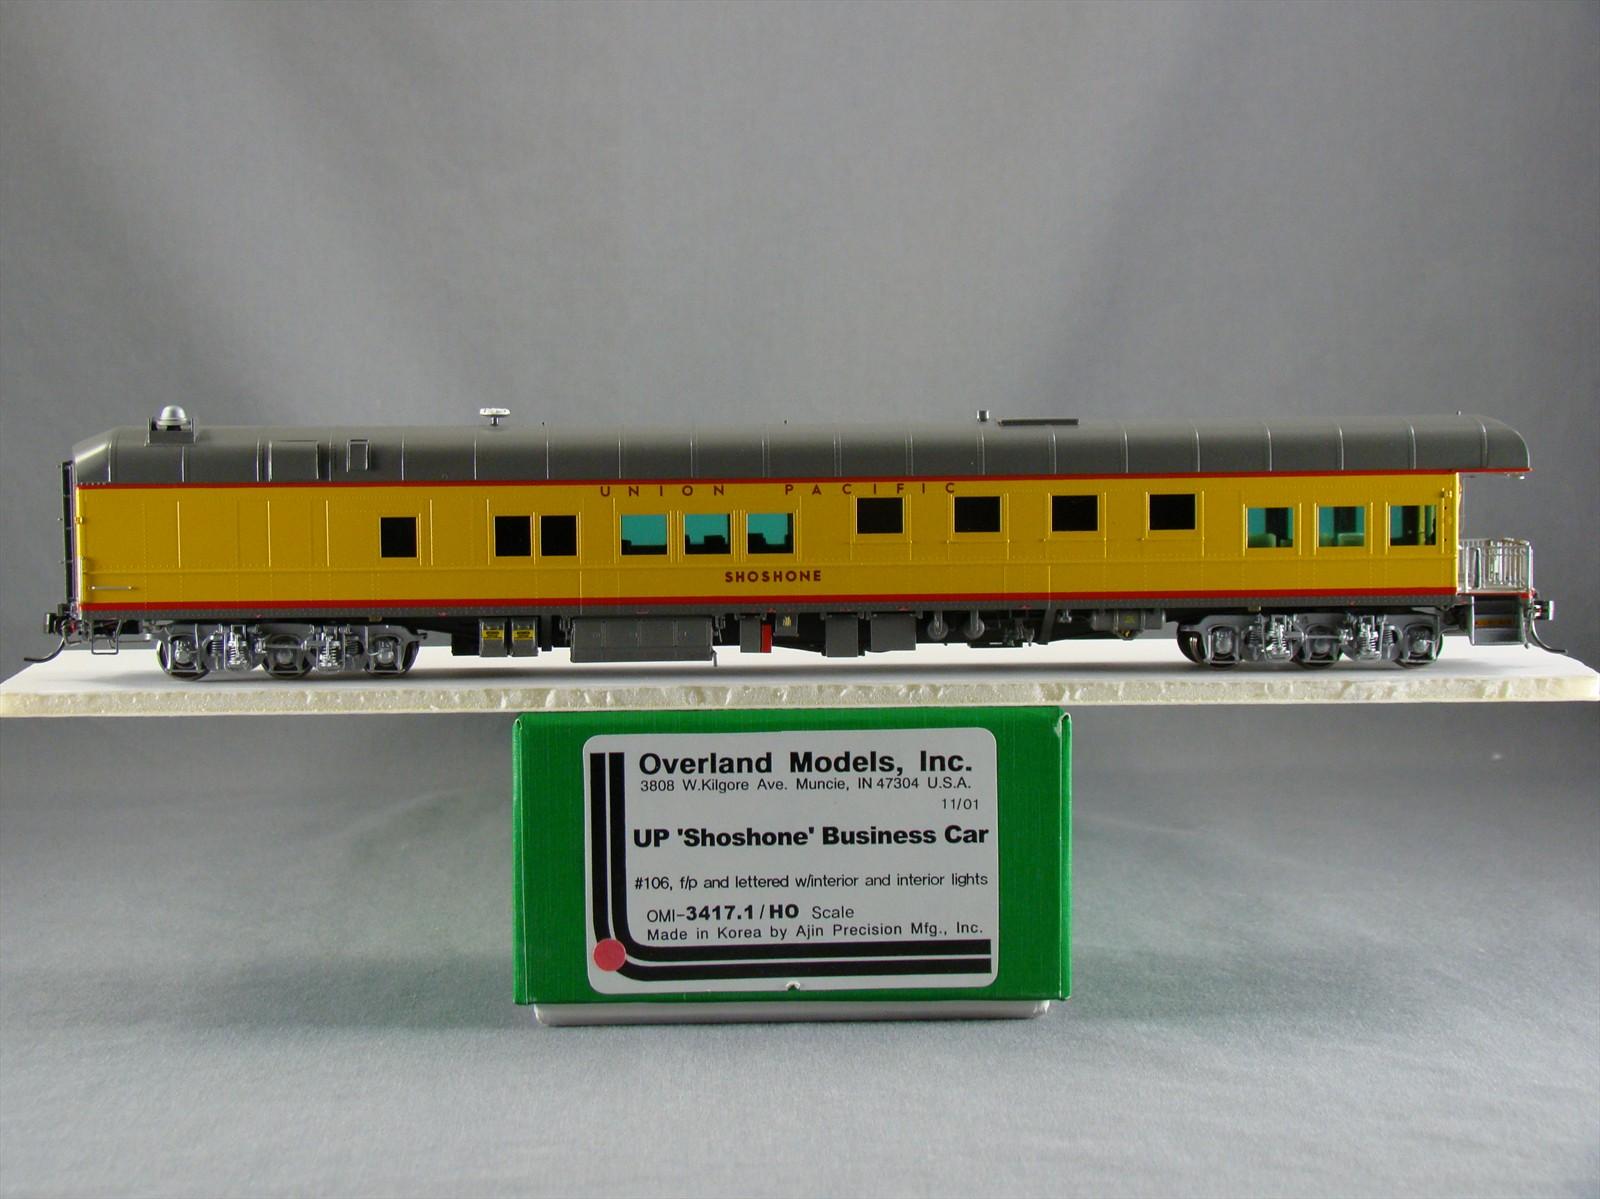 Overland 3417.1 - UP Modern Executive Business Car 'Shoshone',10